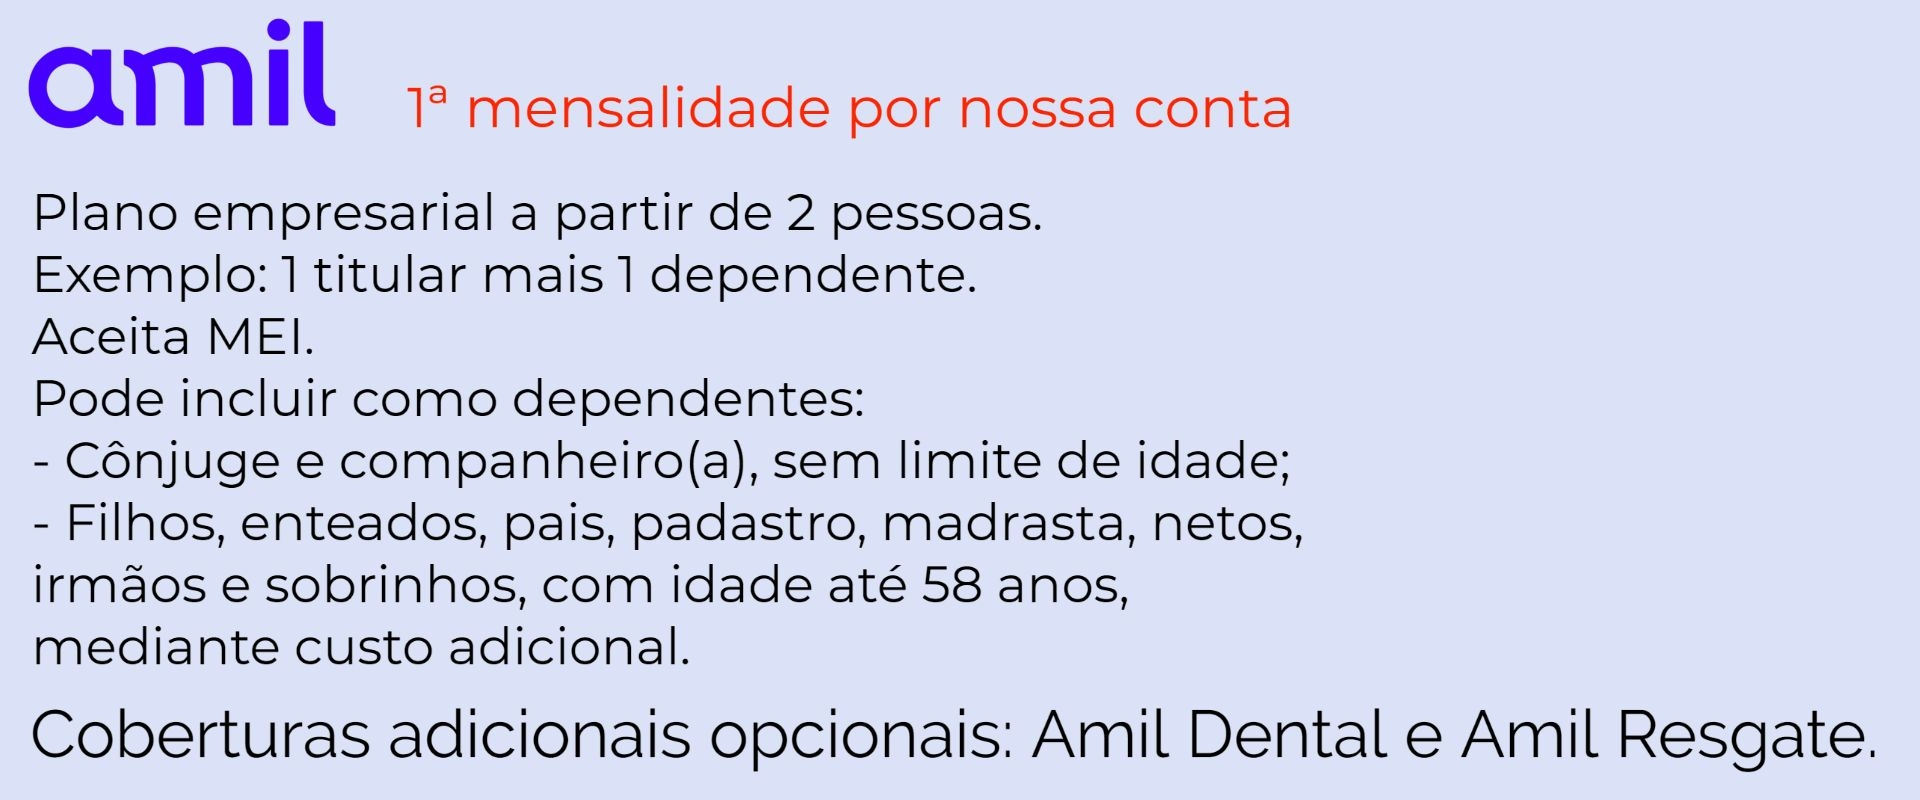 Amil Empresarial Manaus-AM